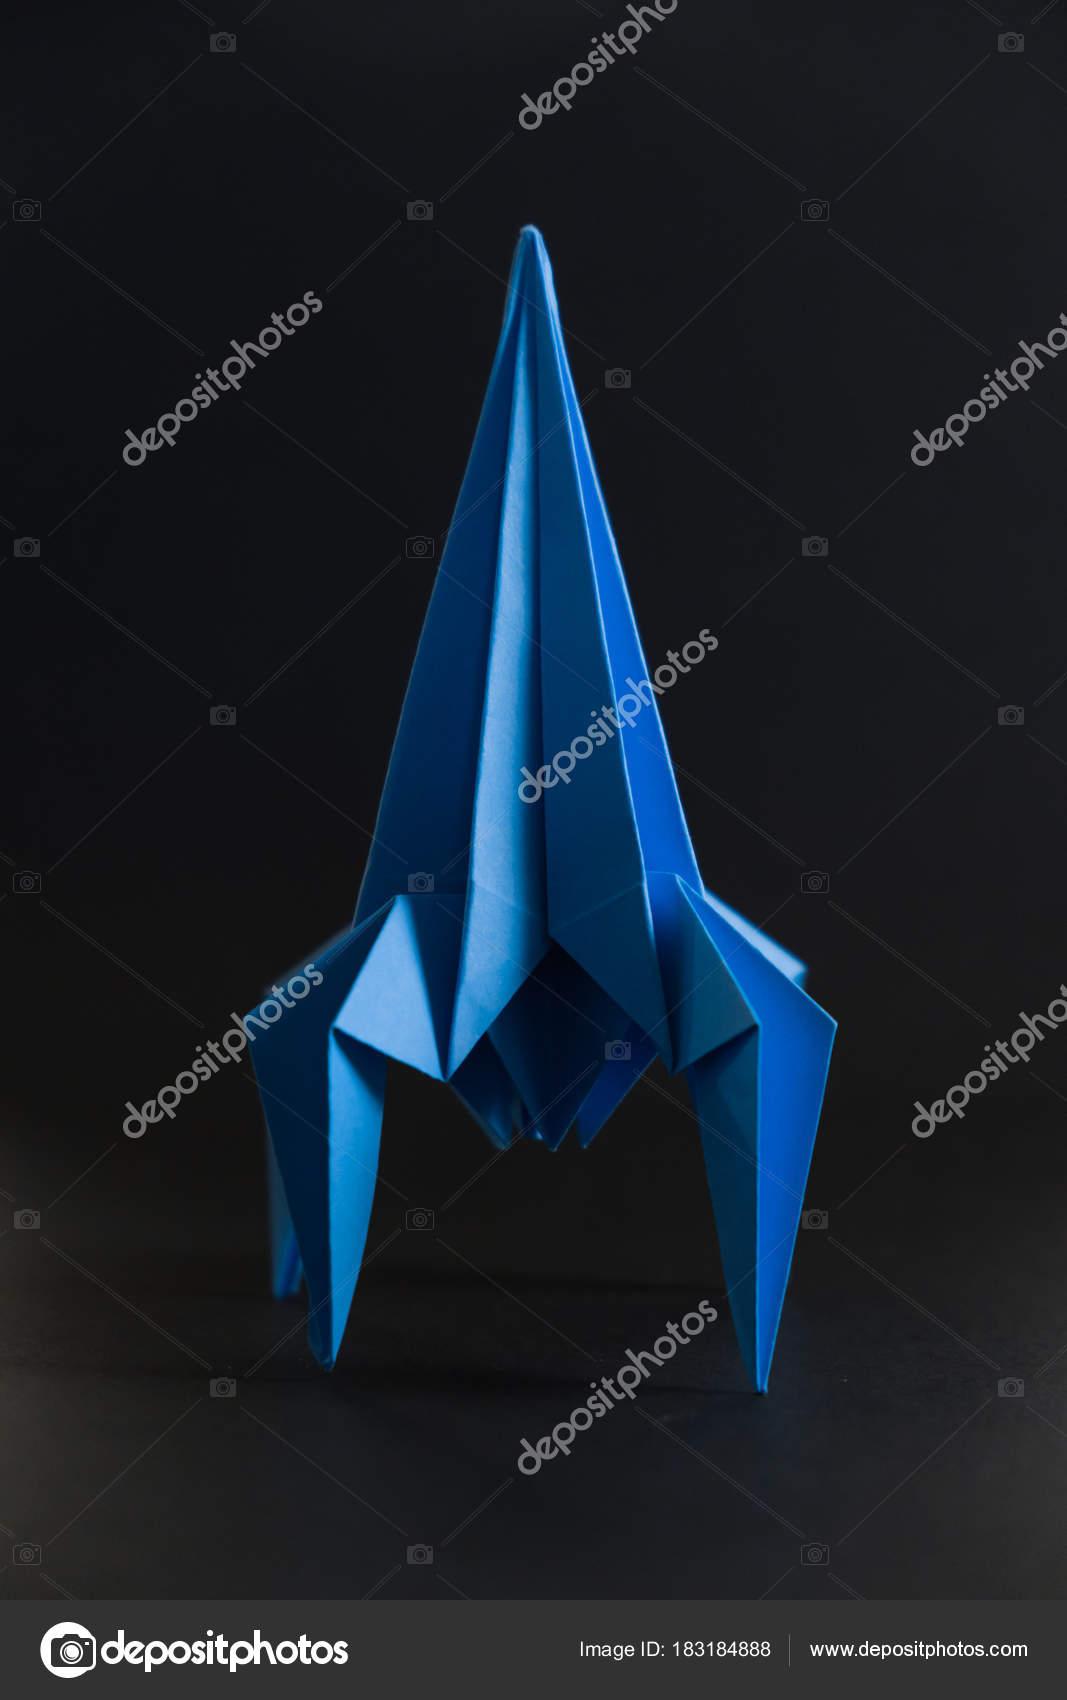 Paper Homemade Origami Rocket Stock Photo